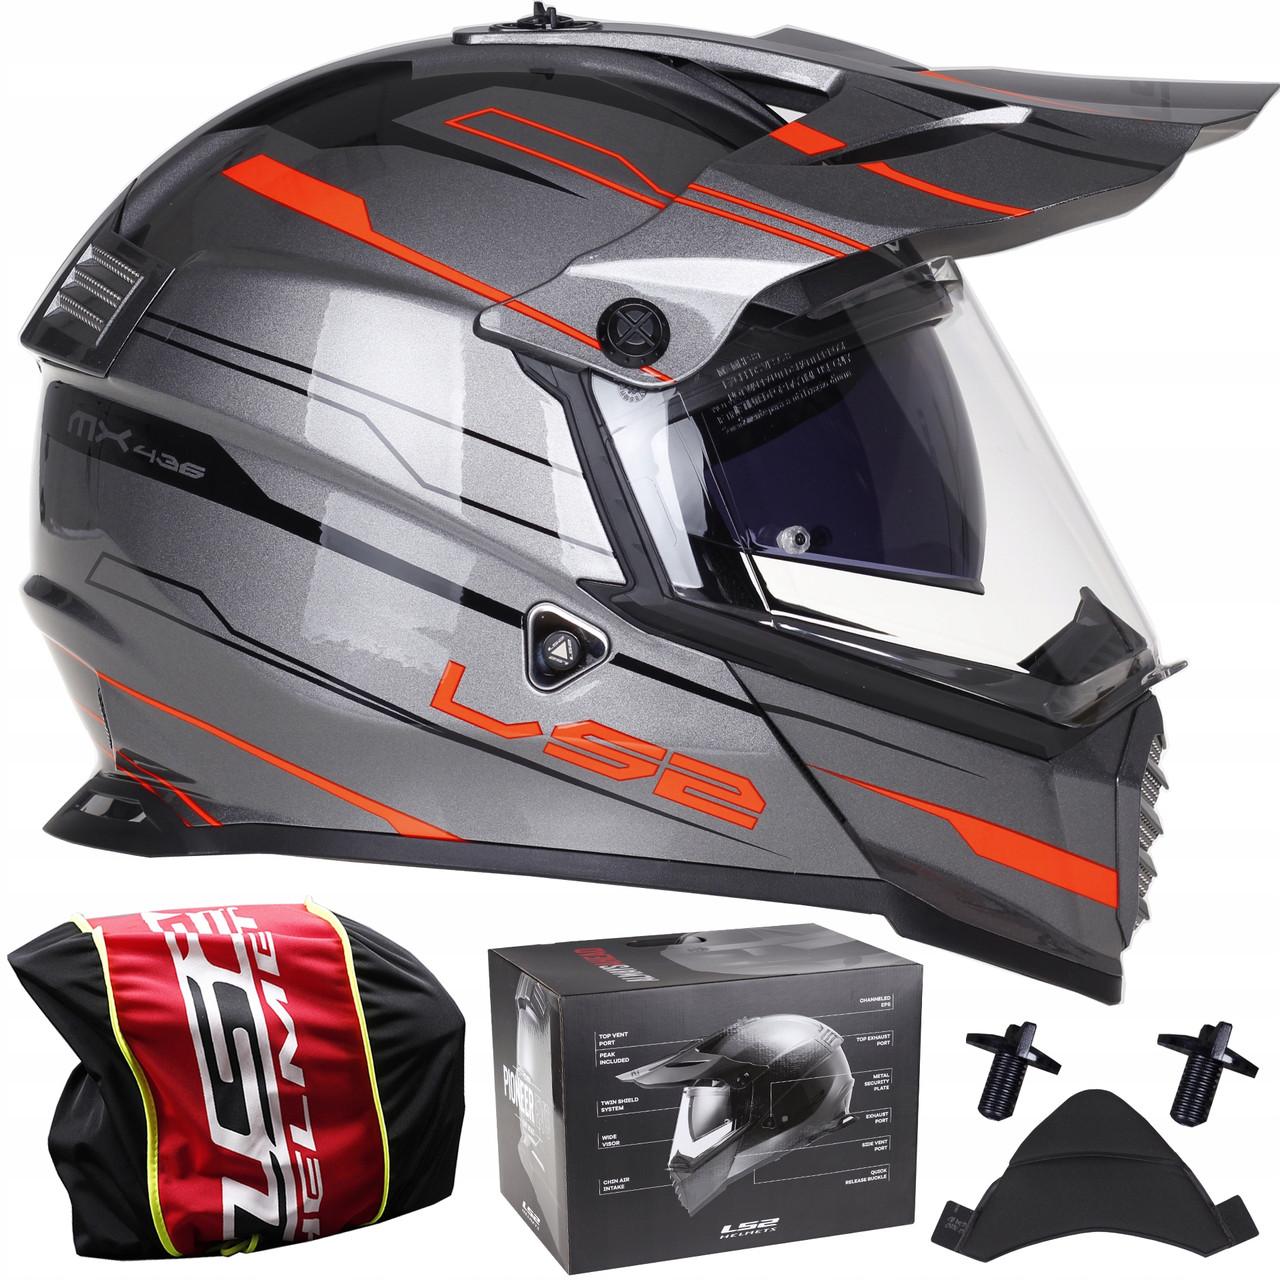 LS2 MX436 PIONEER EVO KNIGHT TITANIUM ORANGE кросс эндуро шлем